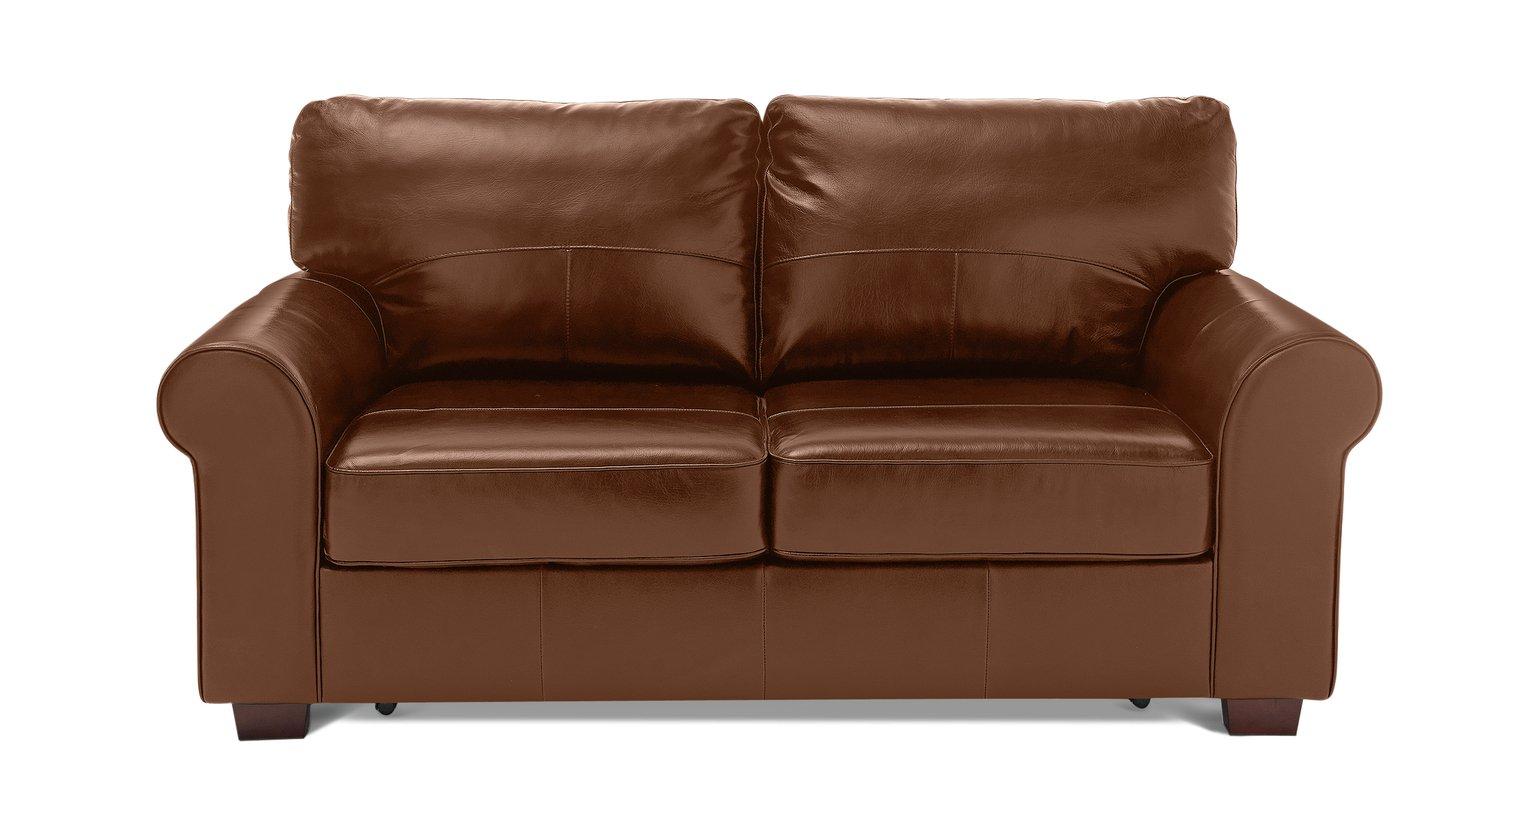 Habitat Salisbury 2 Seater Leather Sofa Bed - Tan